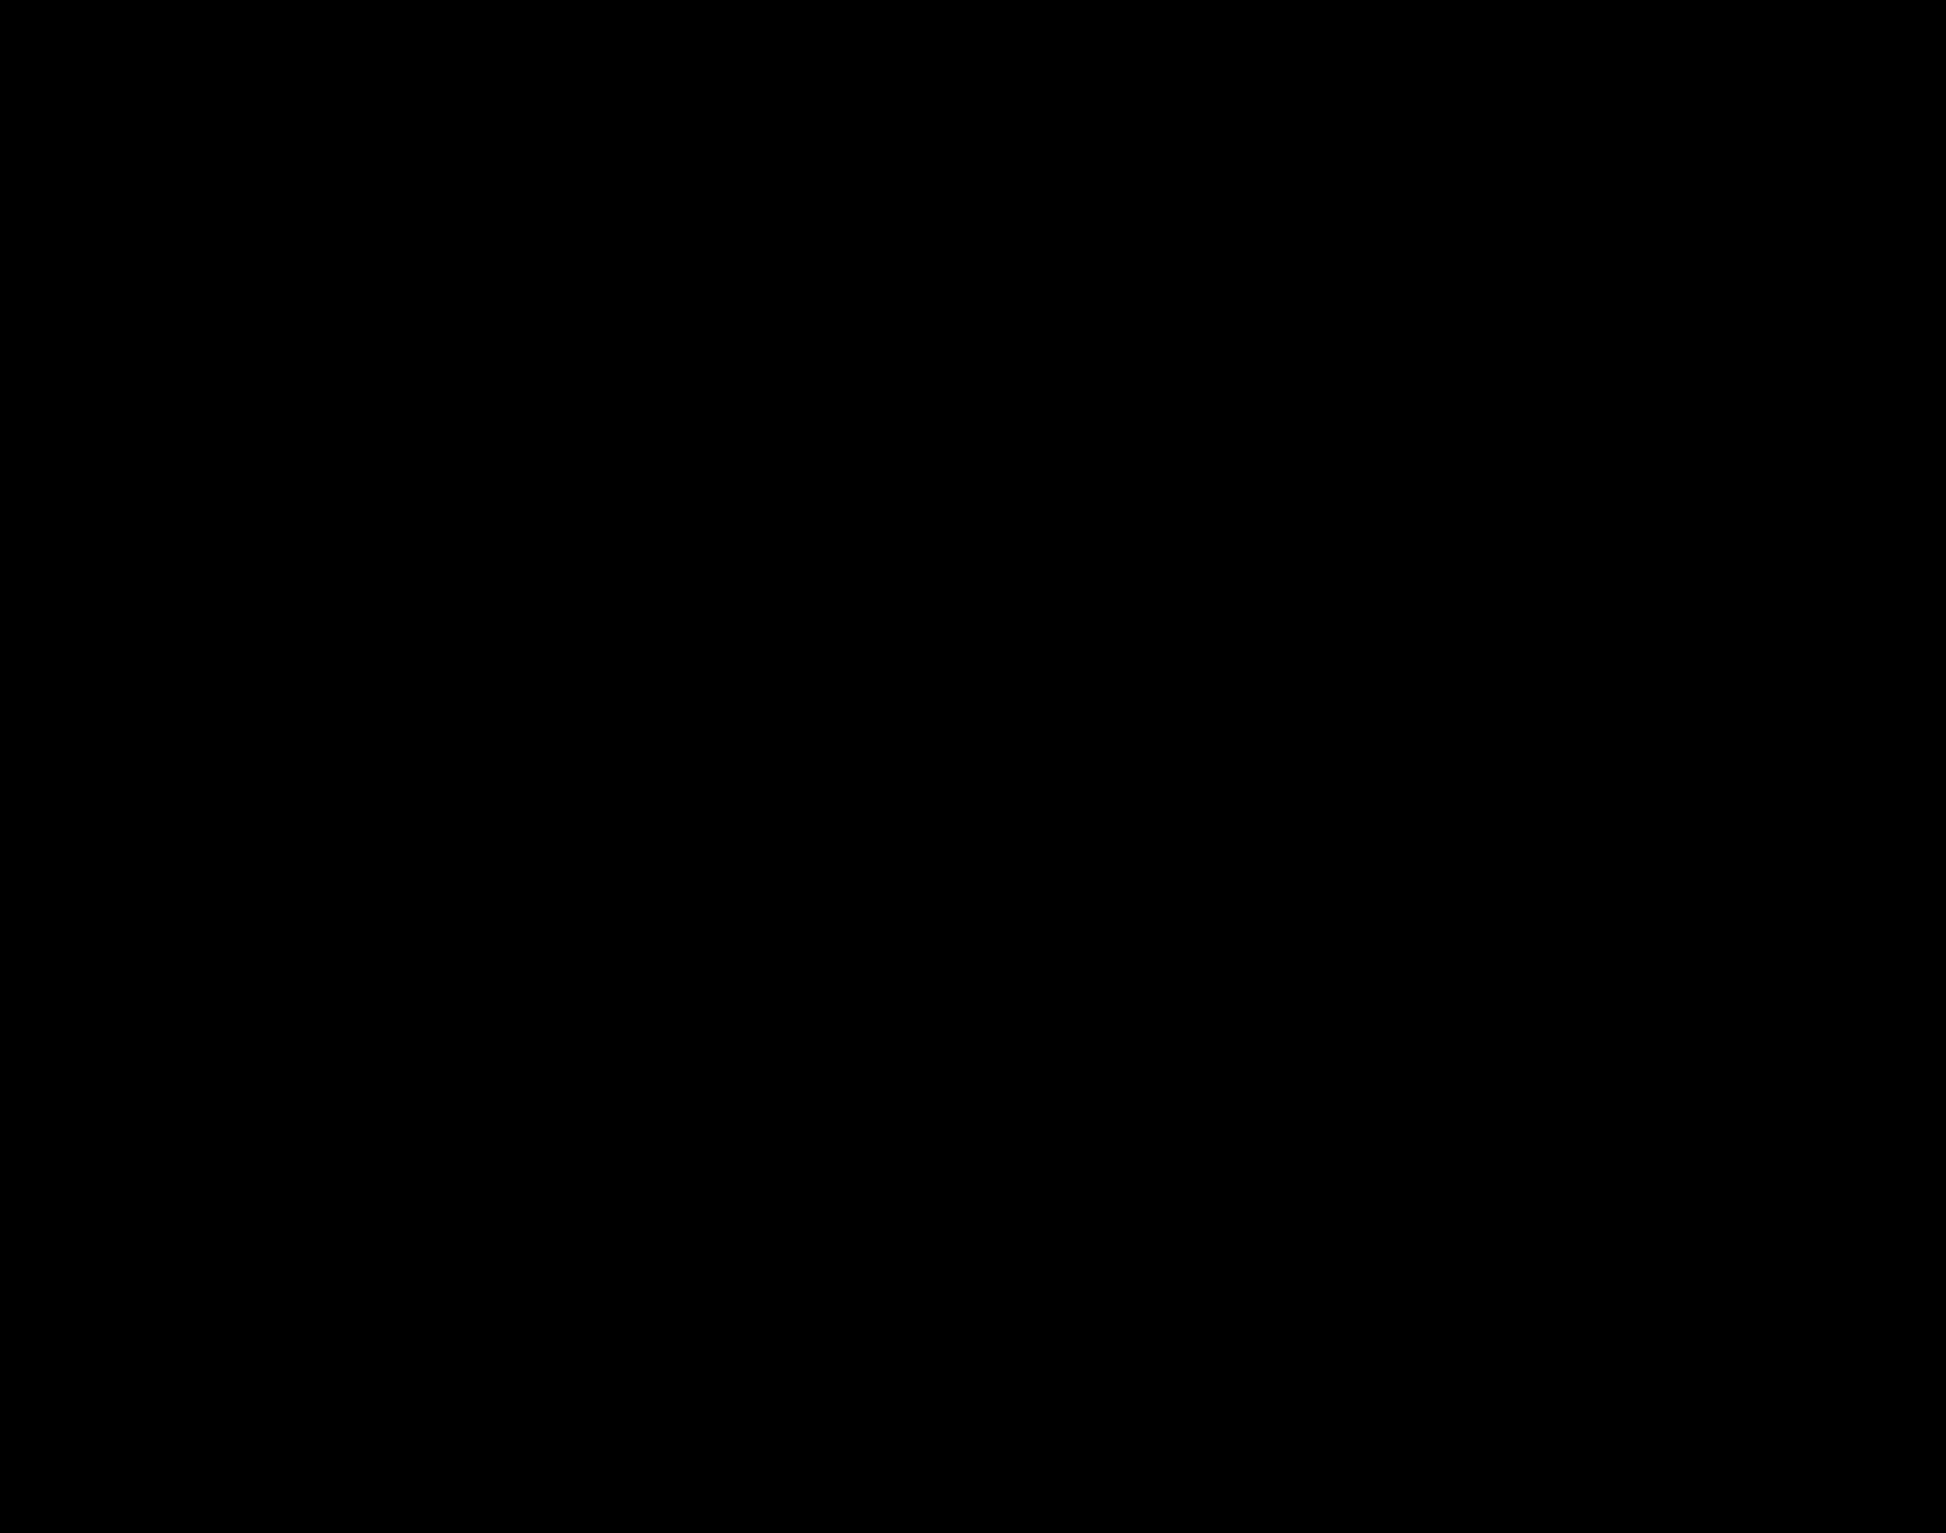 Naklejka na ścianę góry pasmo 6t